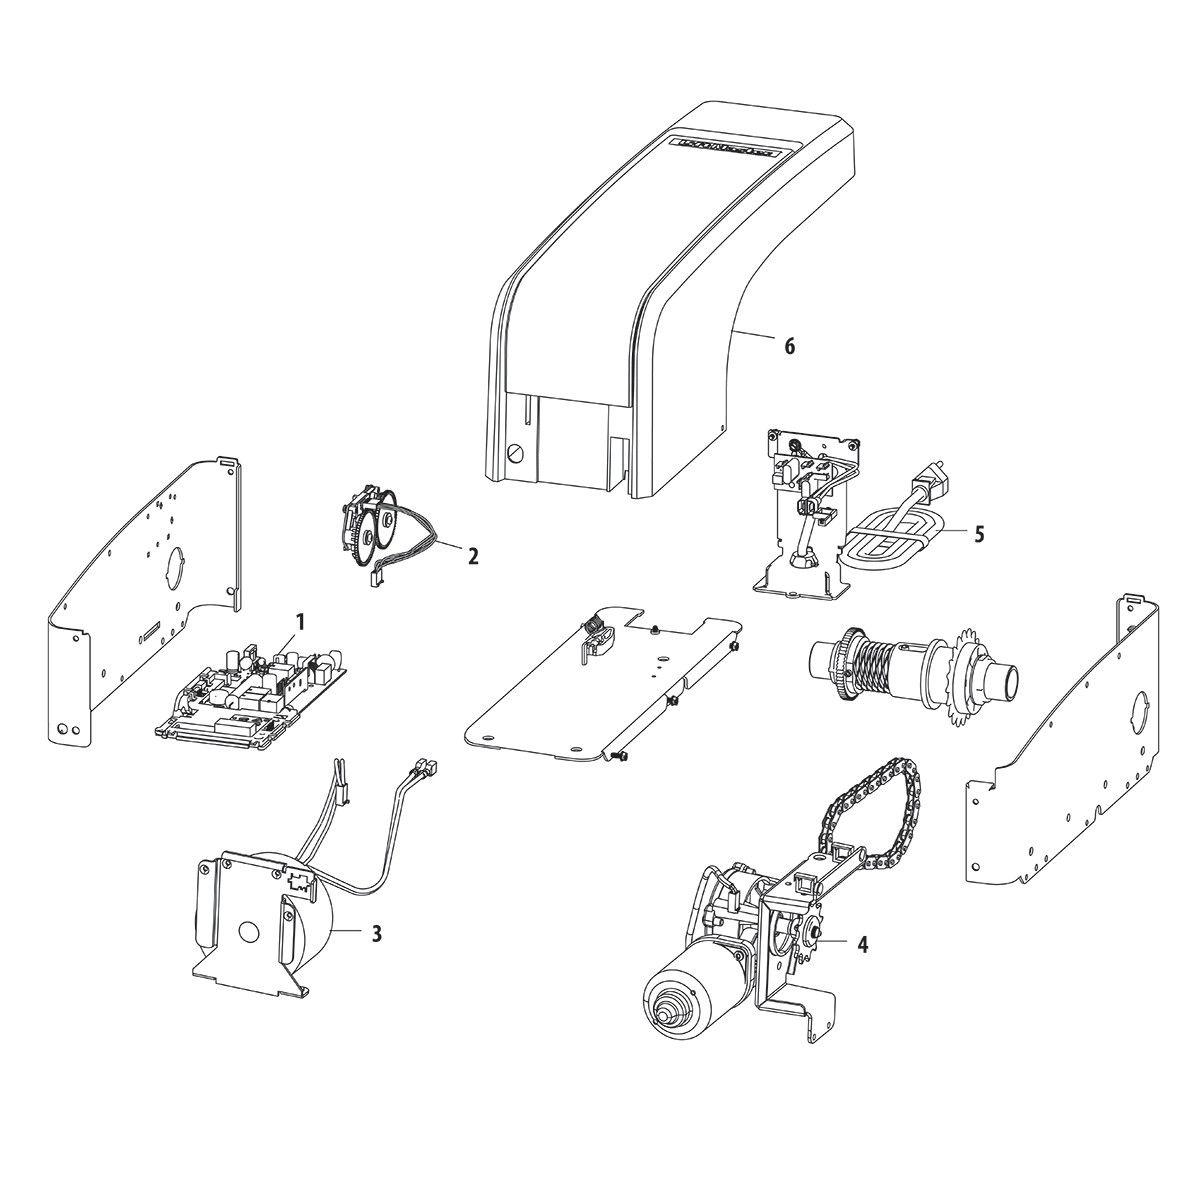 wiring diagram for harley davidson garage door opener wiring diagram for wall mount garage door liftmaster 8500w wall mount garage door opener | liftmaster